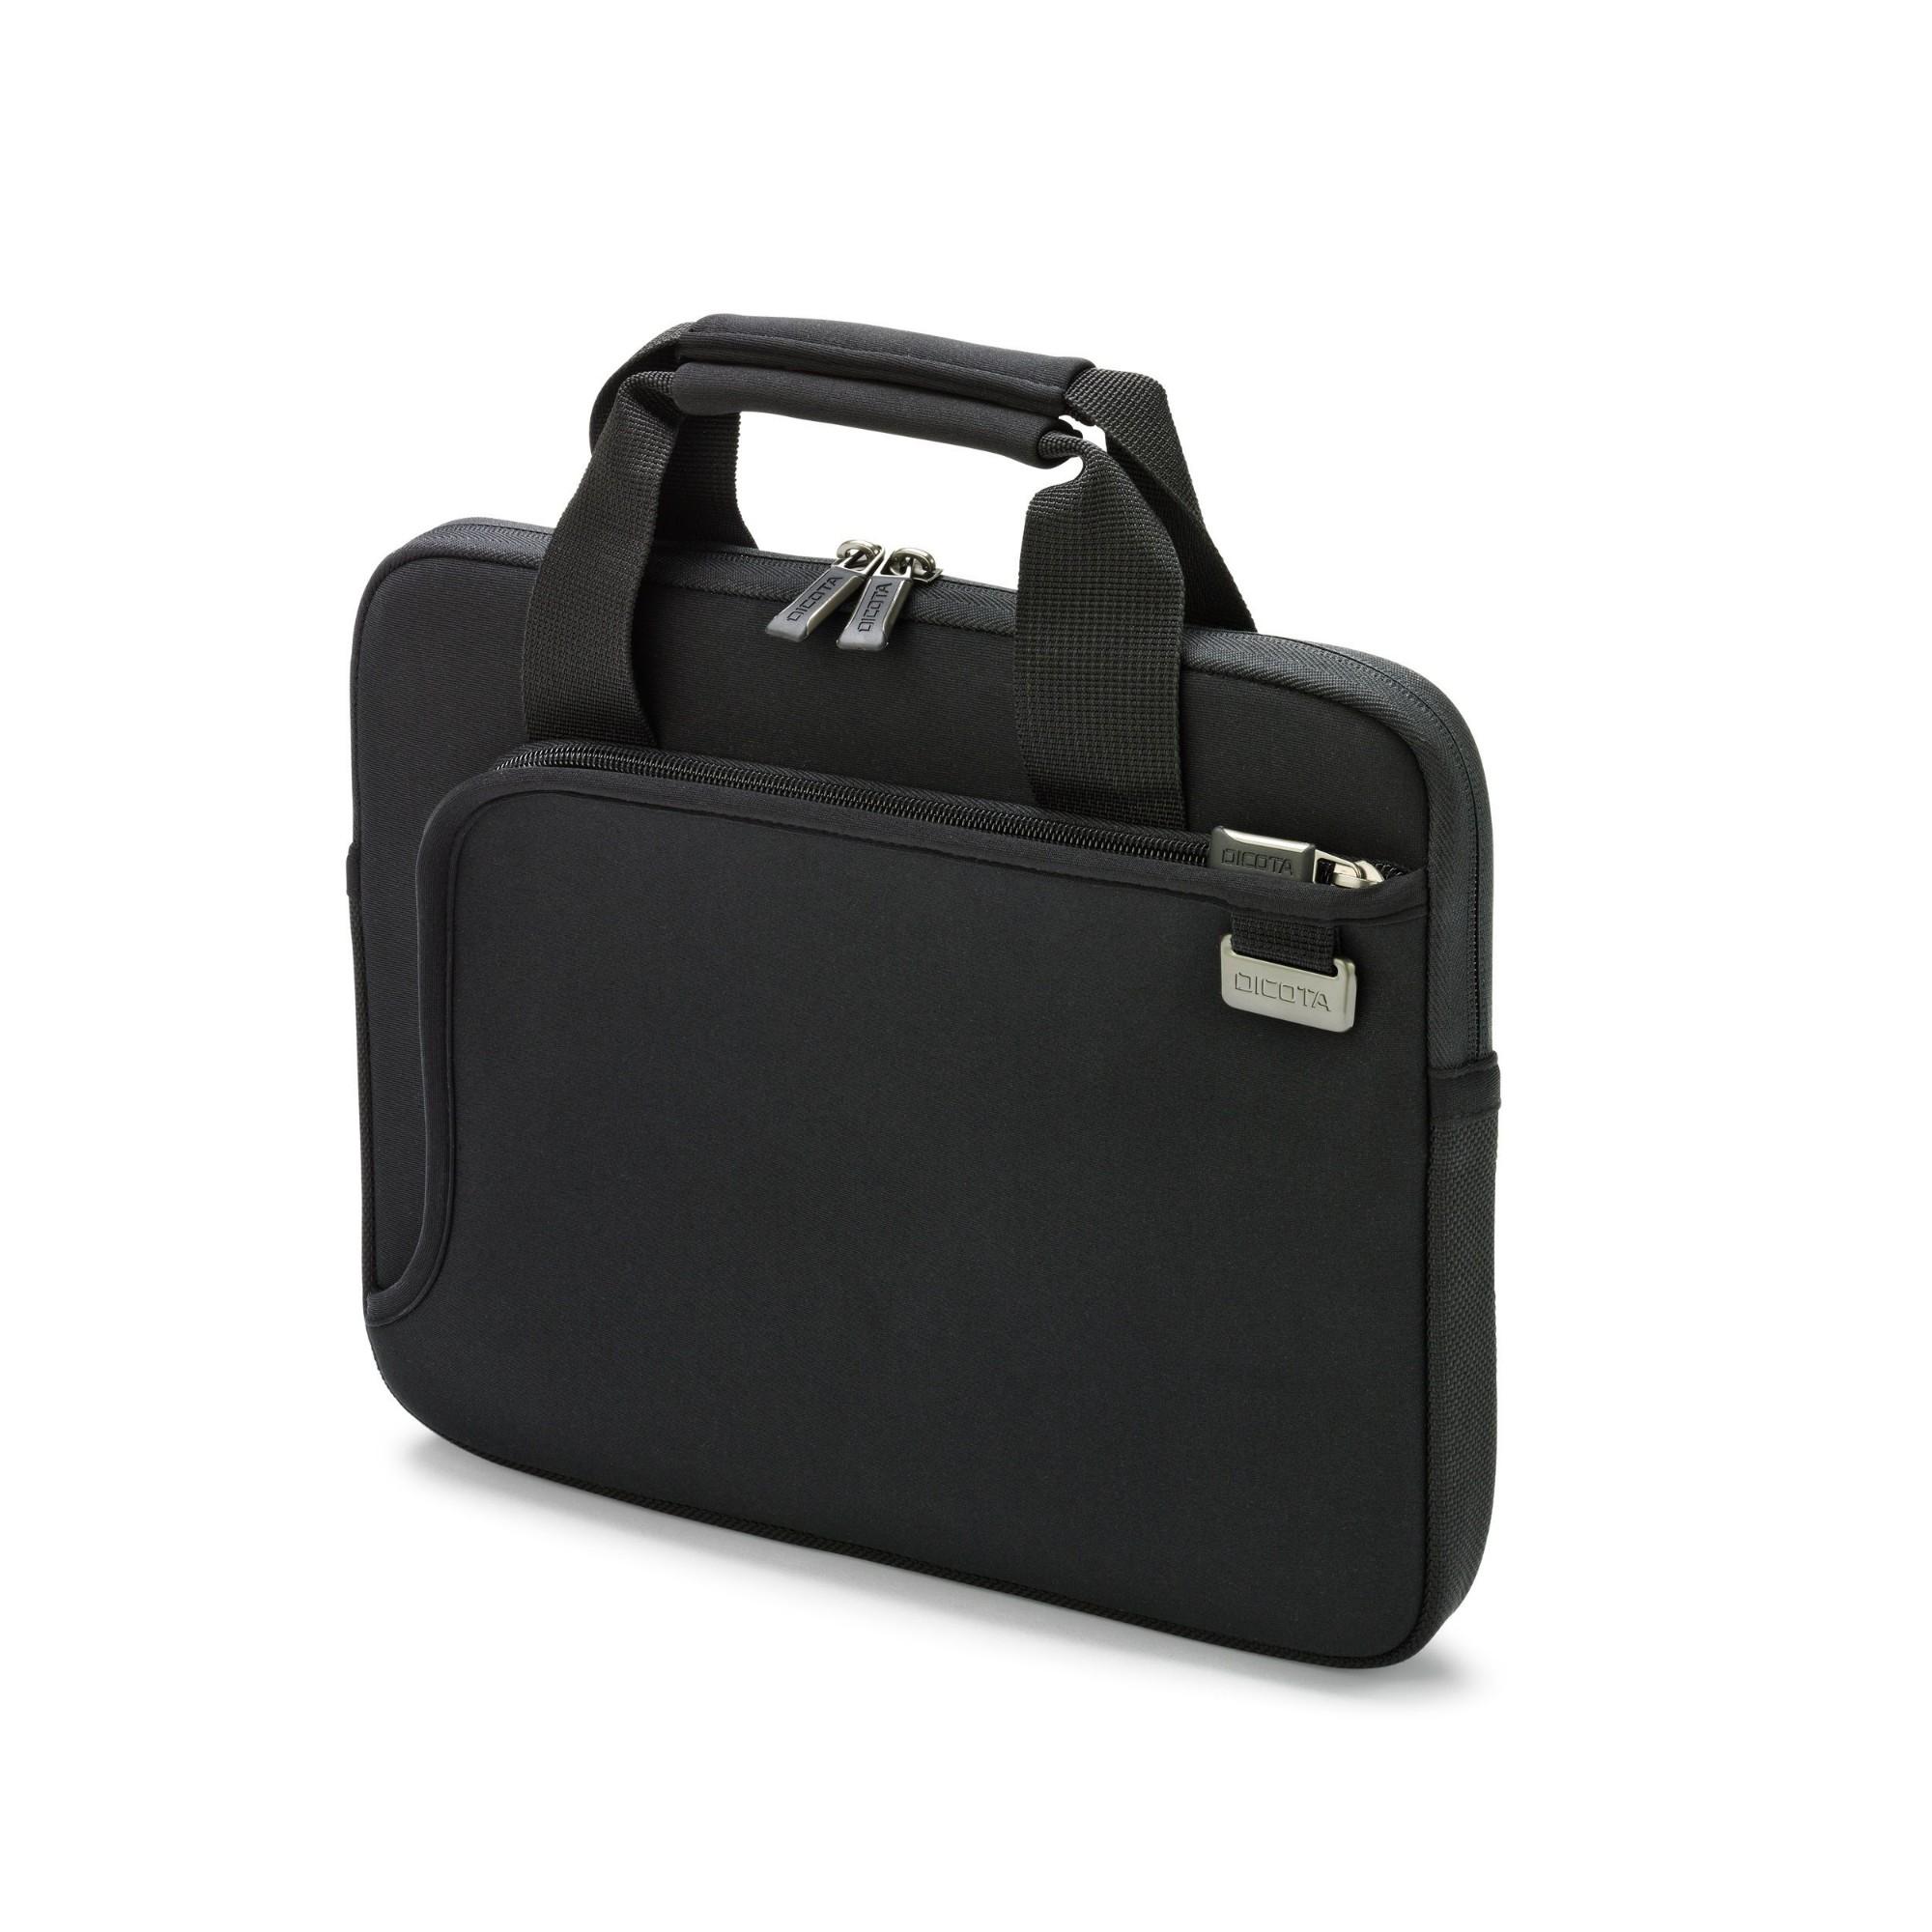 "Dicota Smart Skin 12-12.5 31.8 cm (12.5"") Briefcase Black"